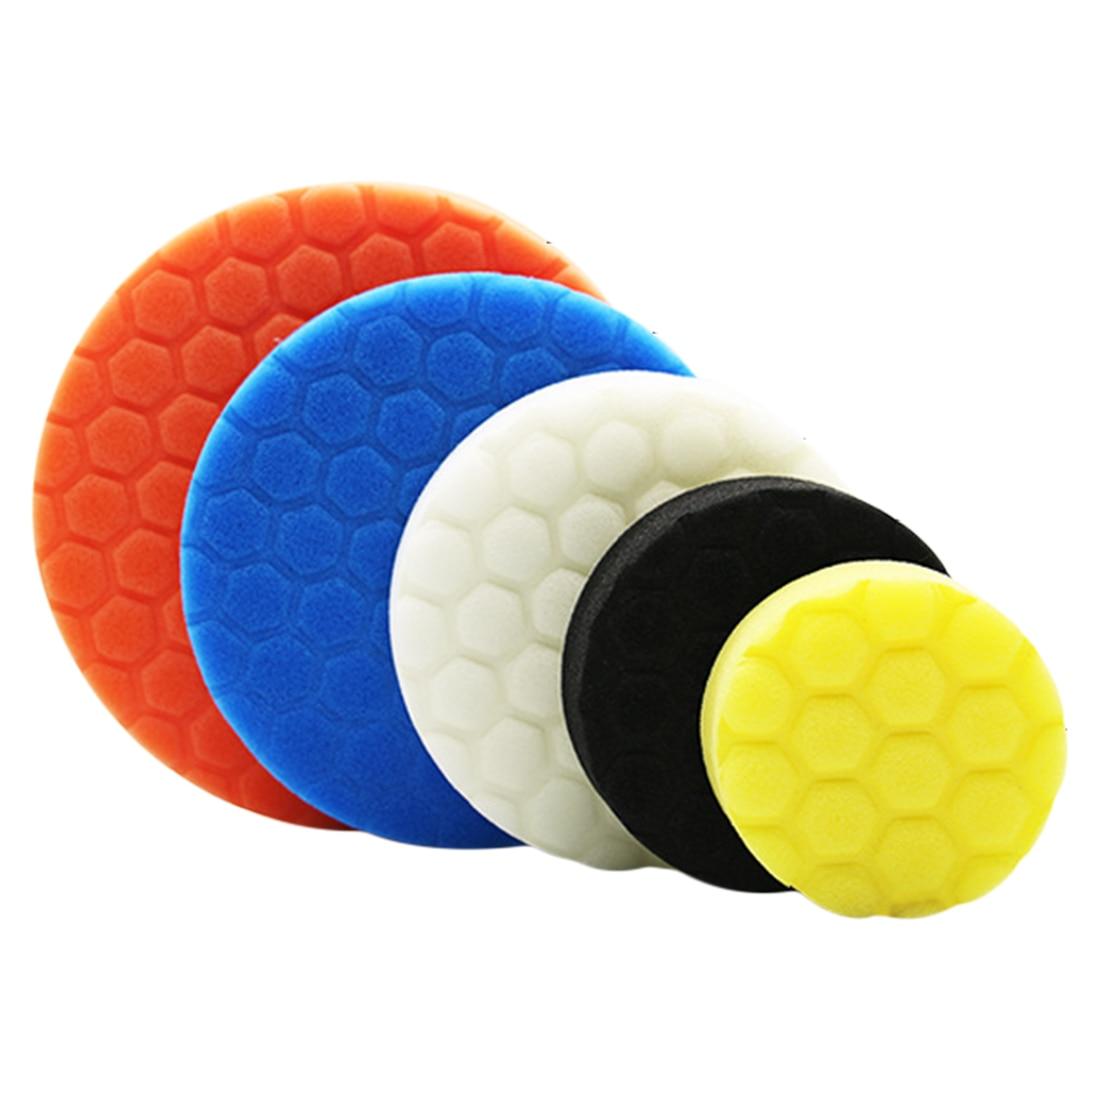 Hexagonal Polished Sponge Disc 3pcs 3/4/5/6/7inch Buffing Sponge Polishing Pad Kit Set For Car Polisher Buffer